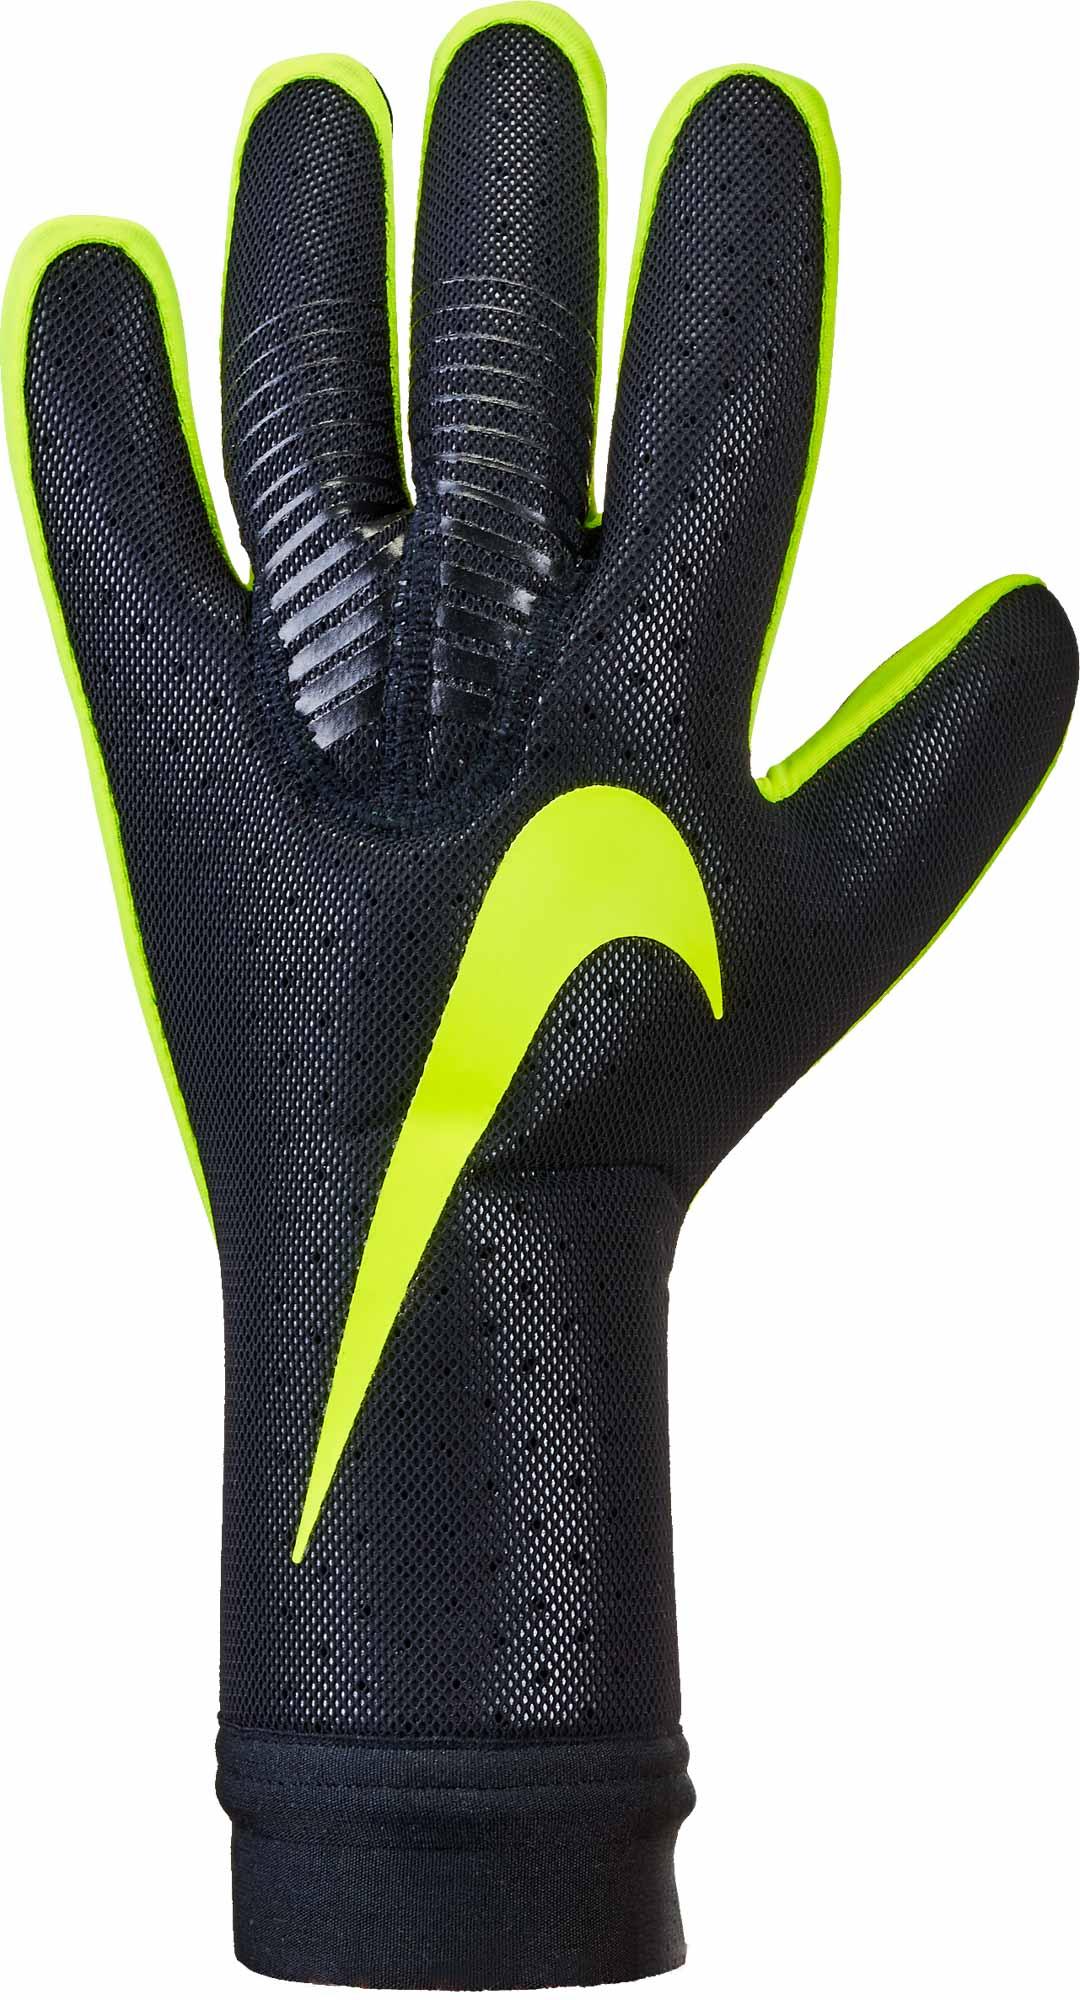 Nike Vapor Touch Goalkeeper Gloves - Black Volt - SoccerPro.com be5084f33a